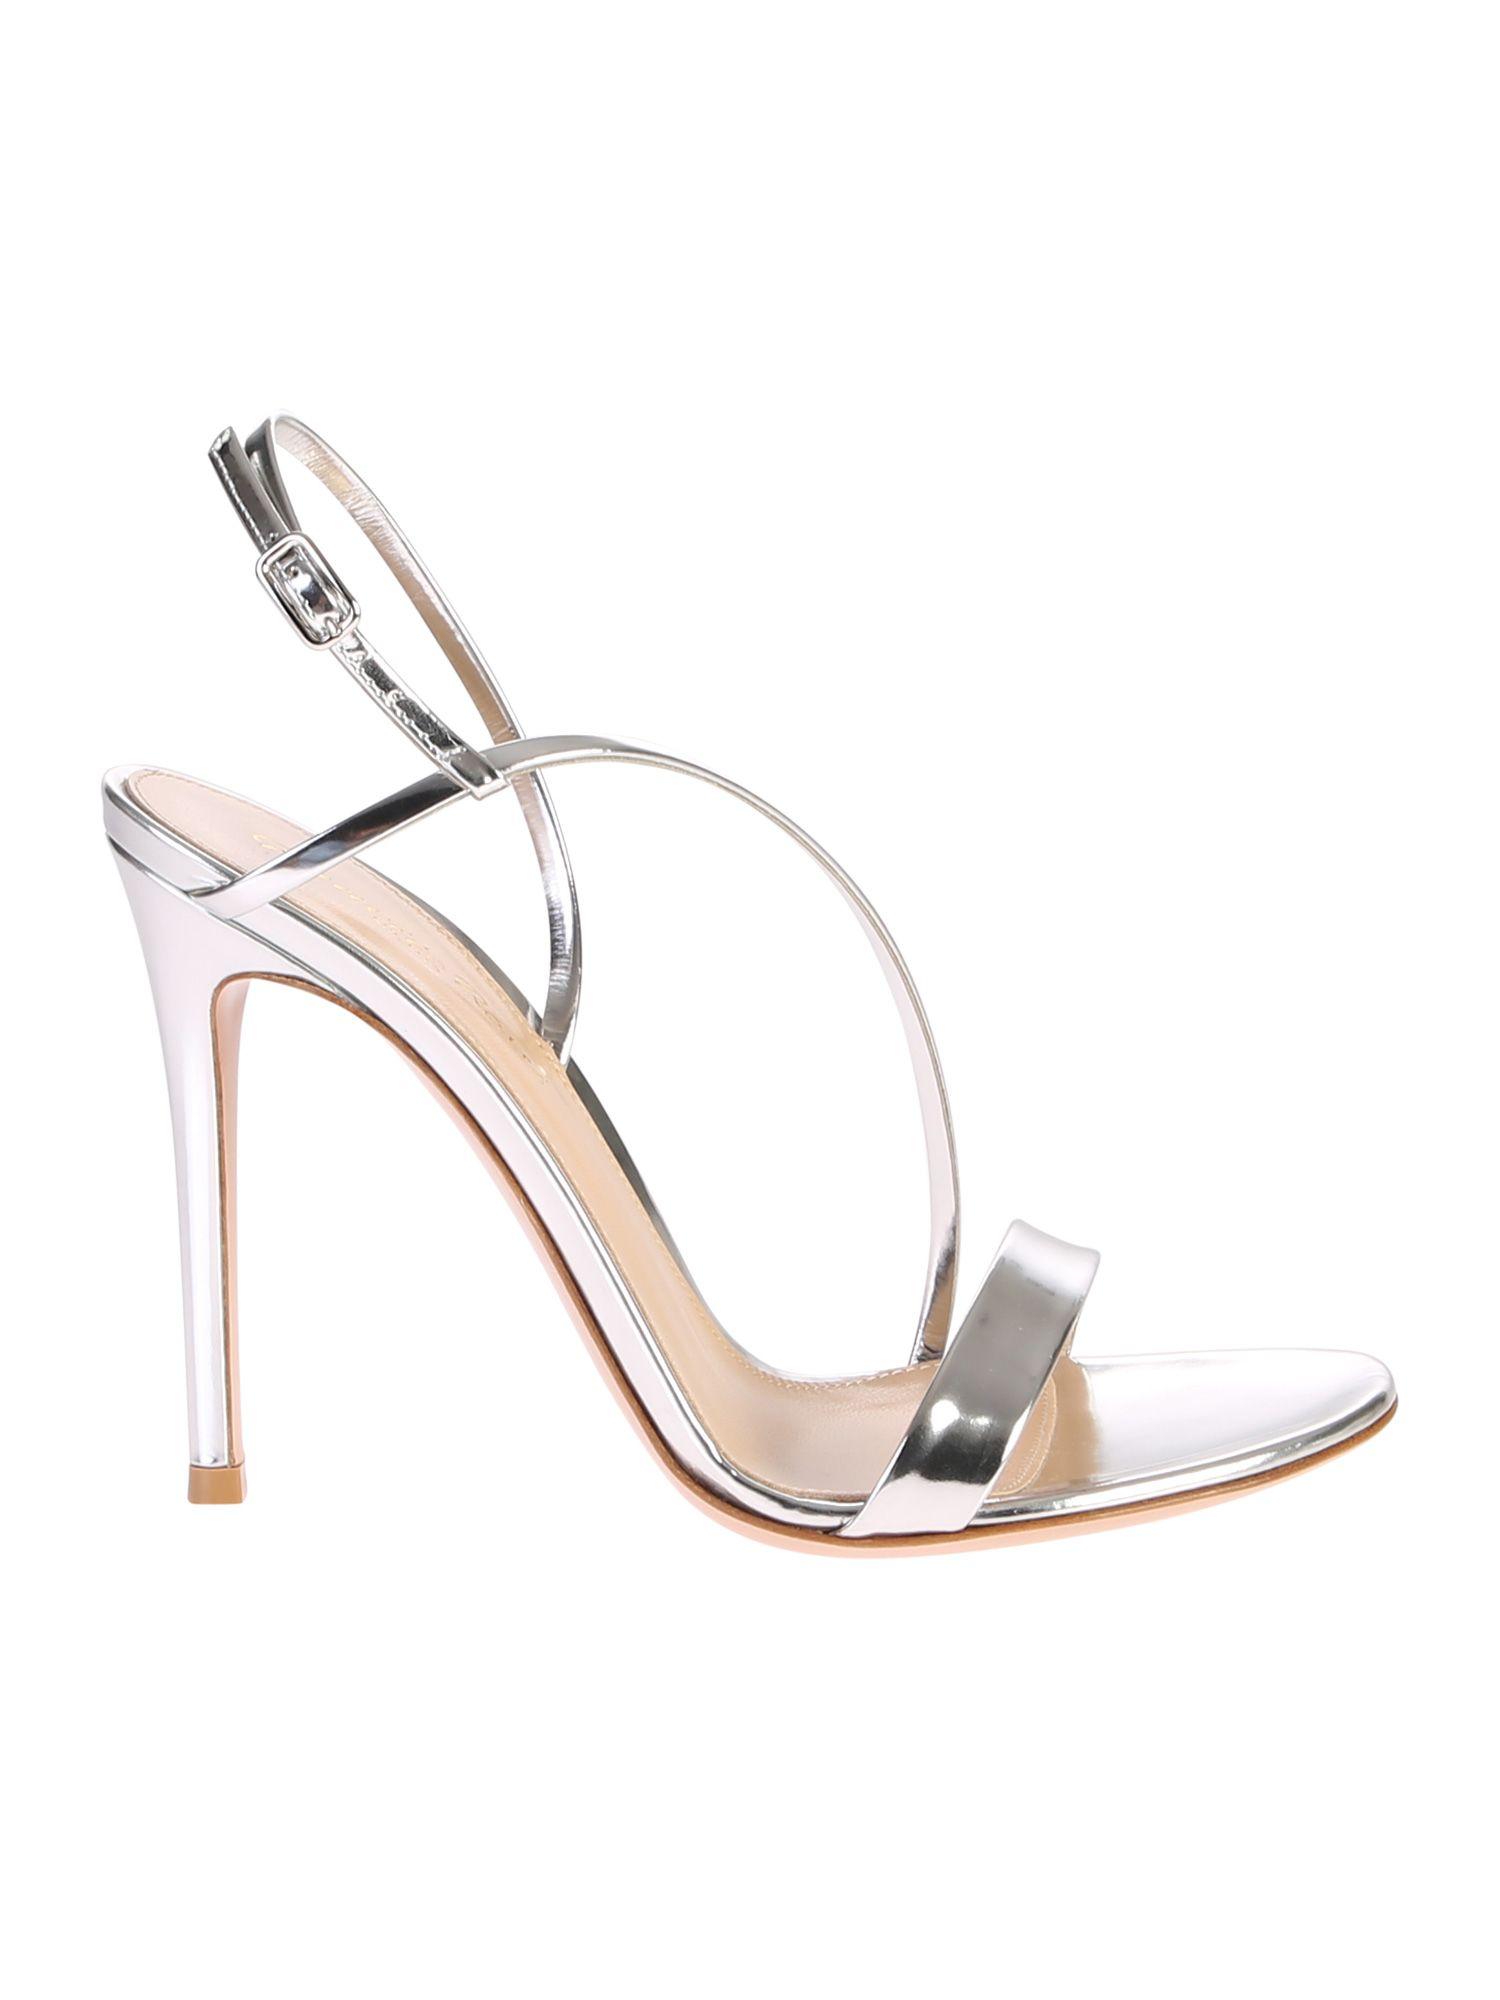 b9ebd345733 Gianvito Rossi Gianvito Rossi Metallic Sandals - Basic - 10830361 ...